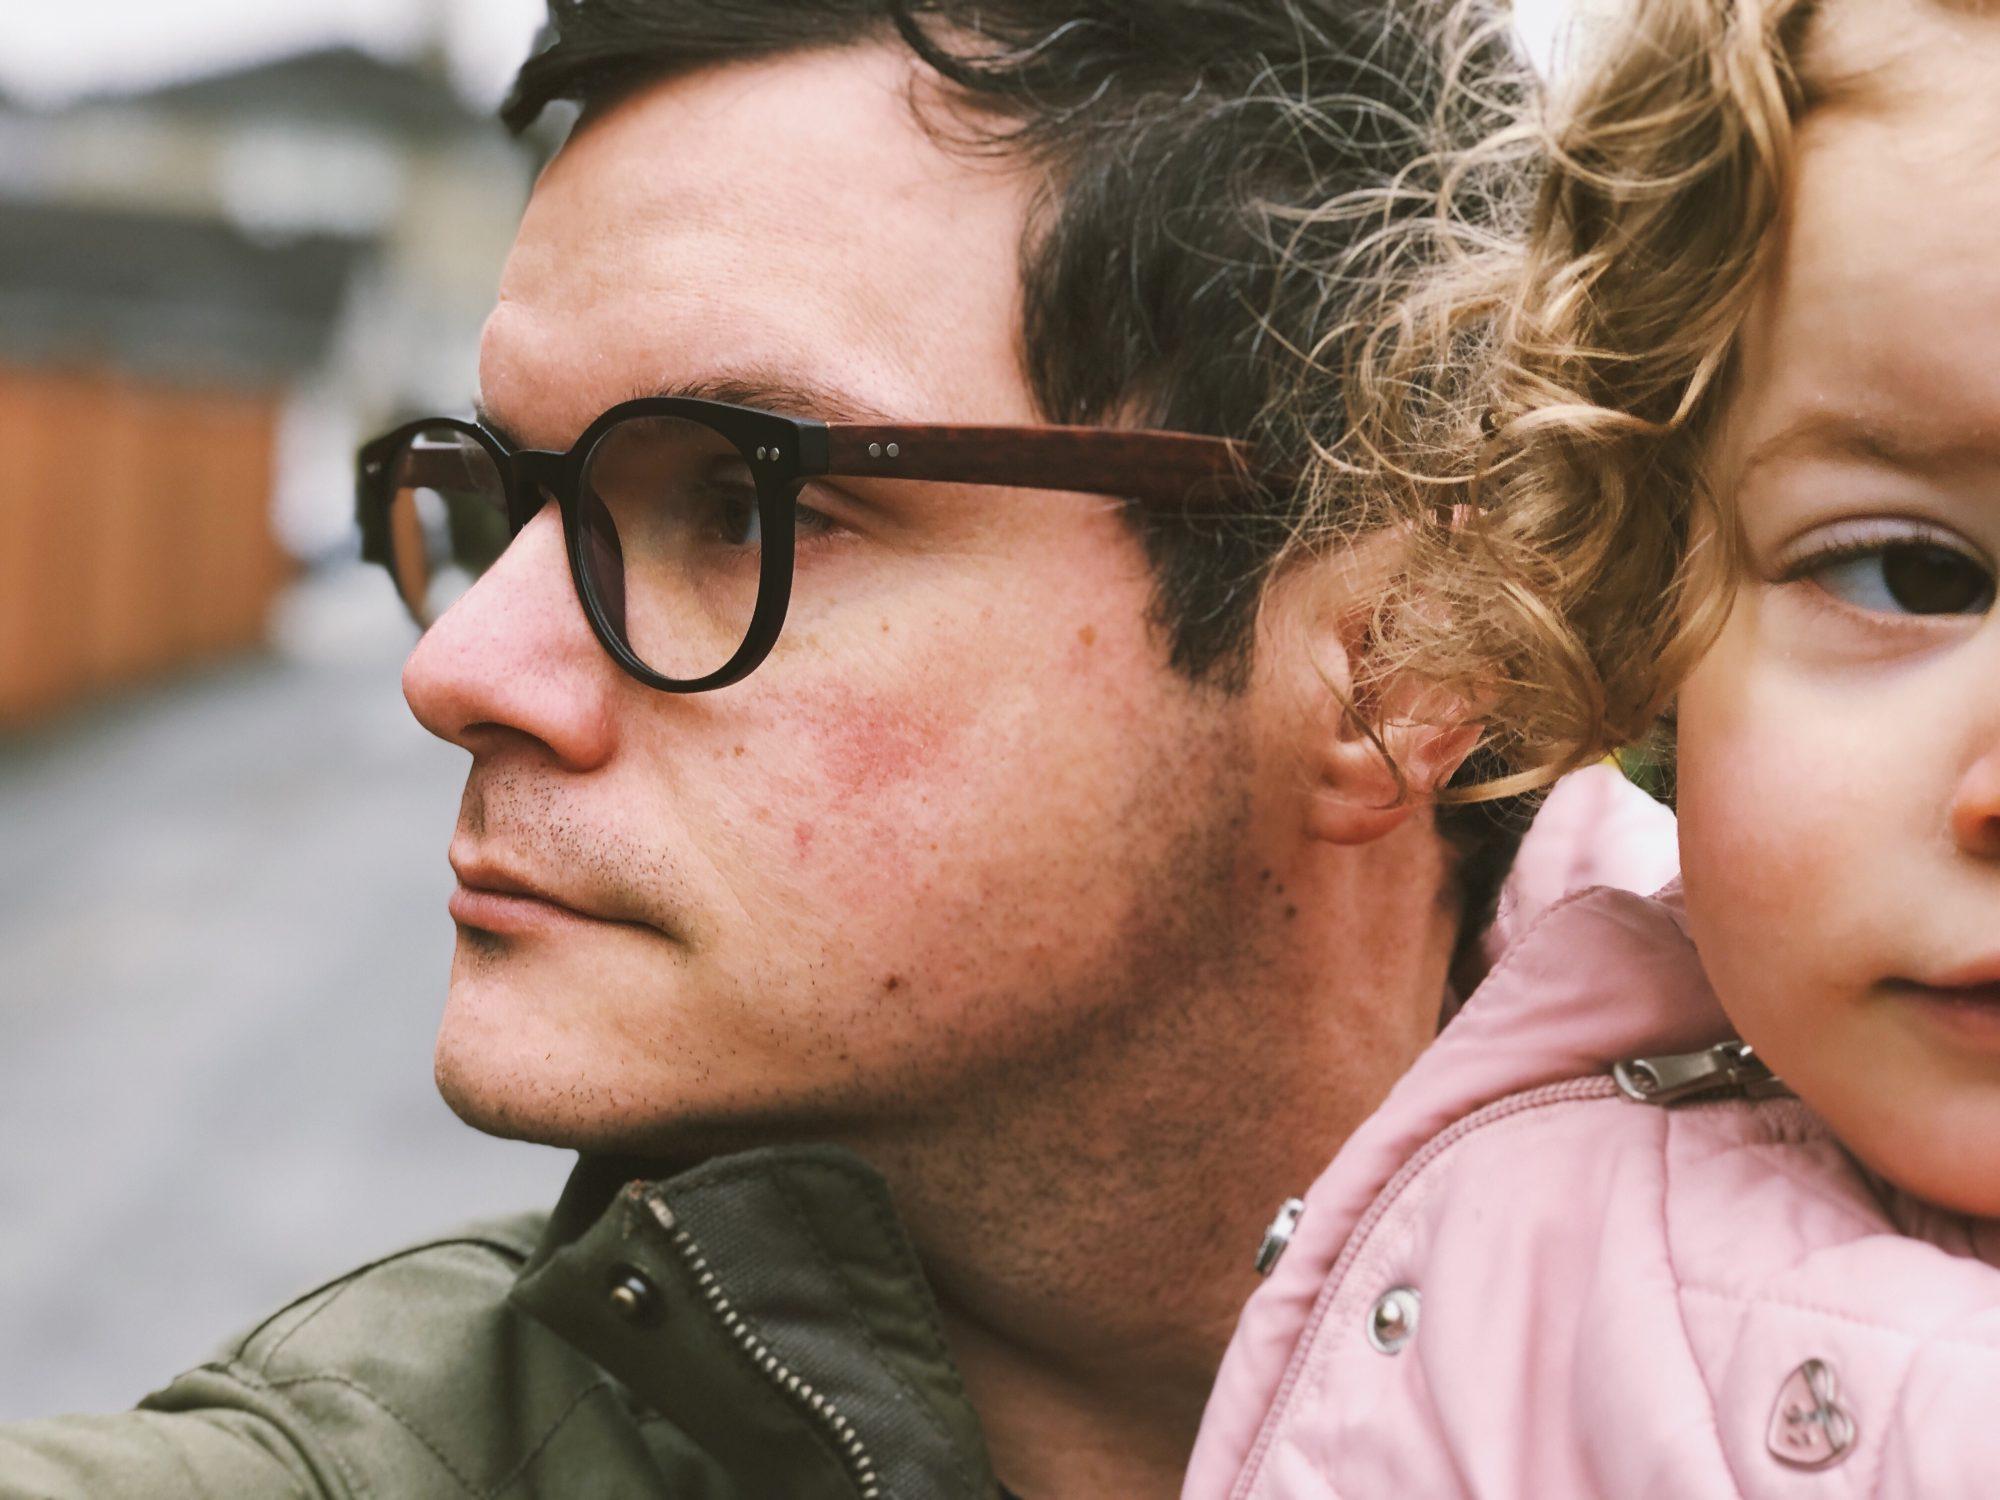 dadlife, toddler, parenting blog, man blog, mens blog, vancity dad, canadian dad, canada dad, best dad blogs in canada, dad blog, social dad, james smith, james r.c. smith, canada dad, parenting dad, healthy dad blog, mom blog, mum blog,